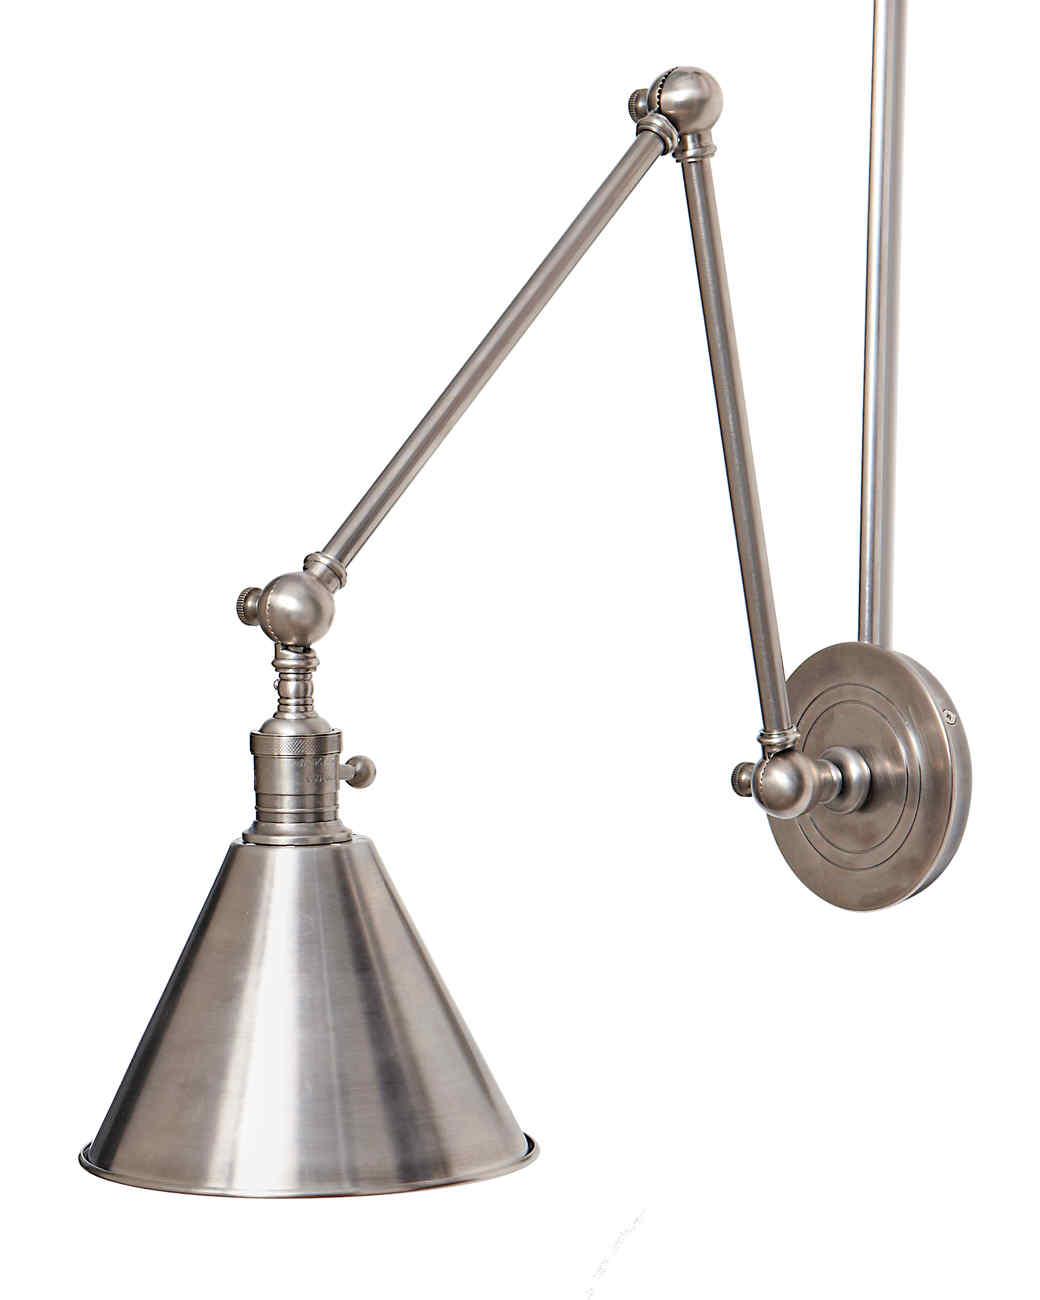 msl-great-rooms-lamp-383-mld110115.jpg